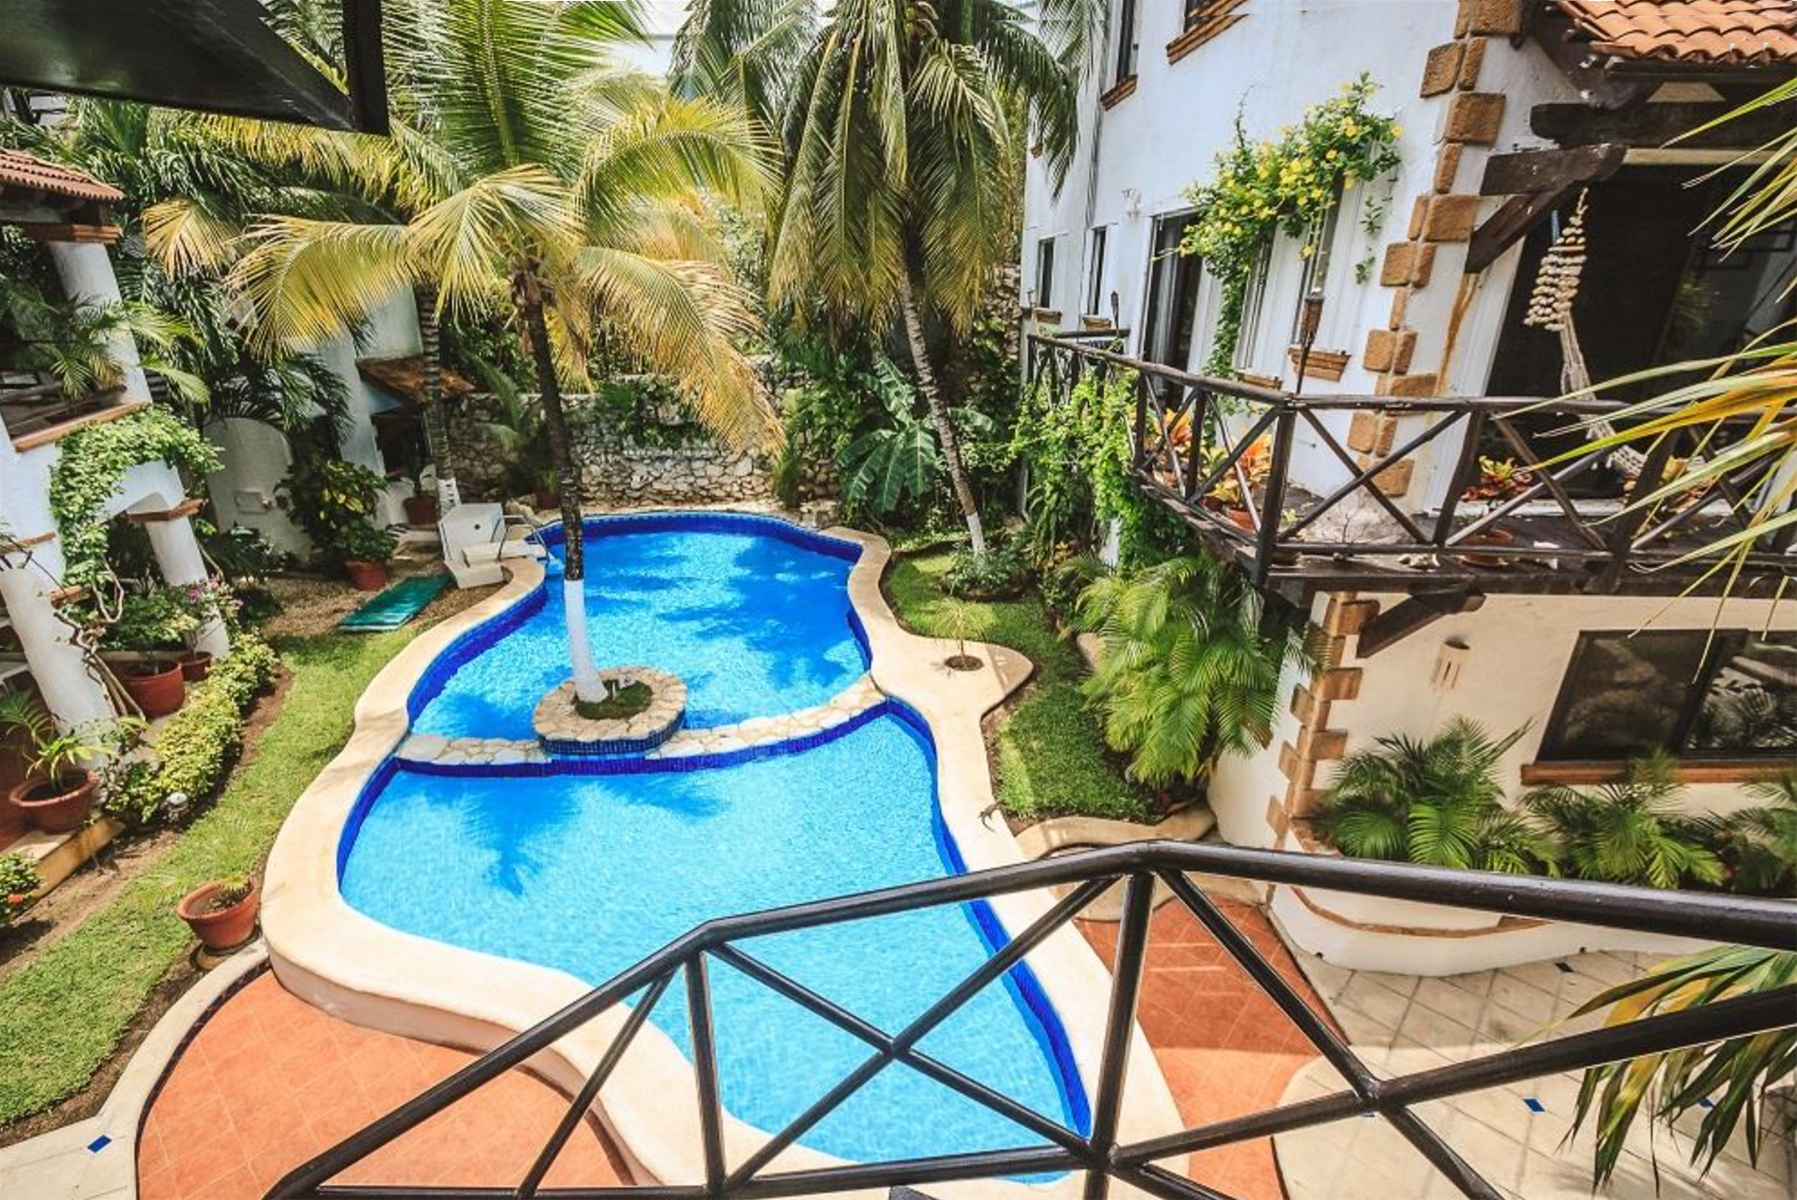 Hacienda San Jose Playa del Carmen Penthouse Home For Sale Real Estate to Buy